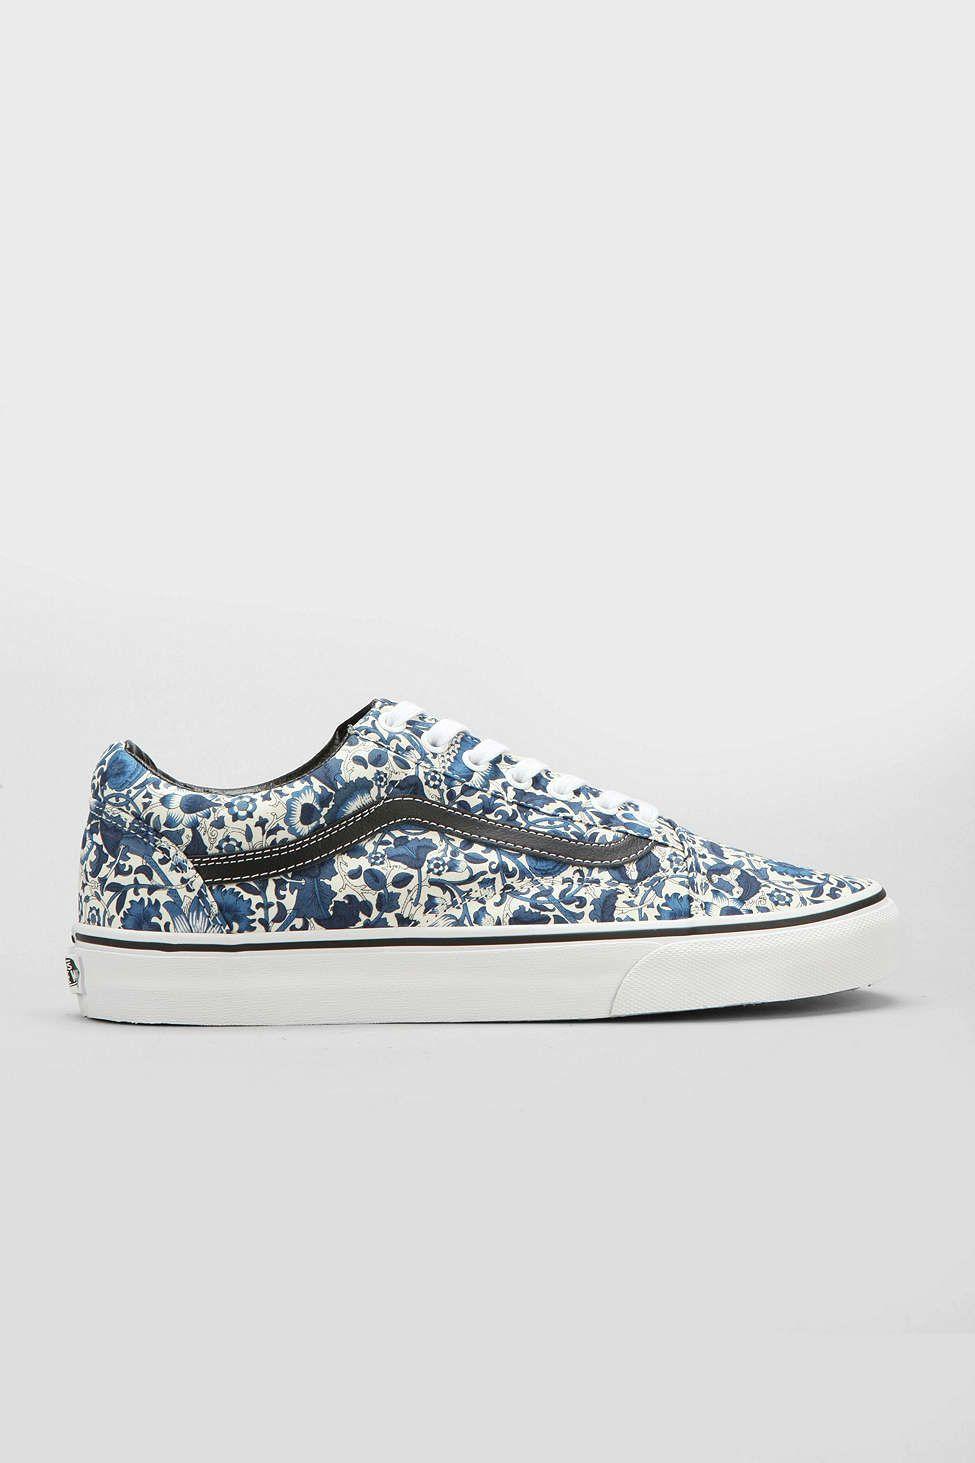 404ce36a9f Vans Liberty Old Skool Men s Sneaker